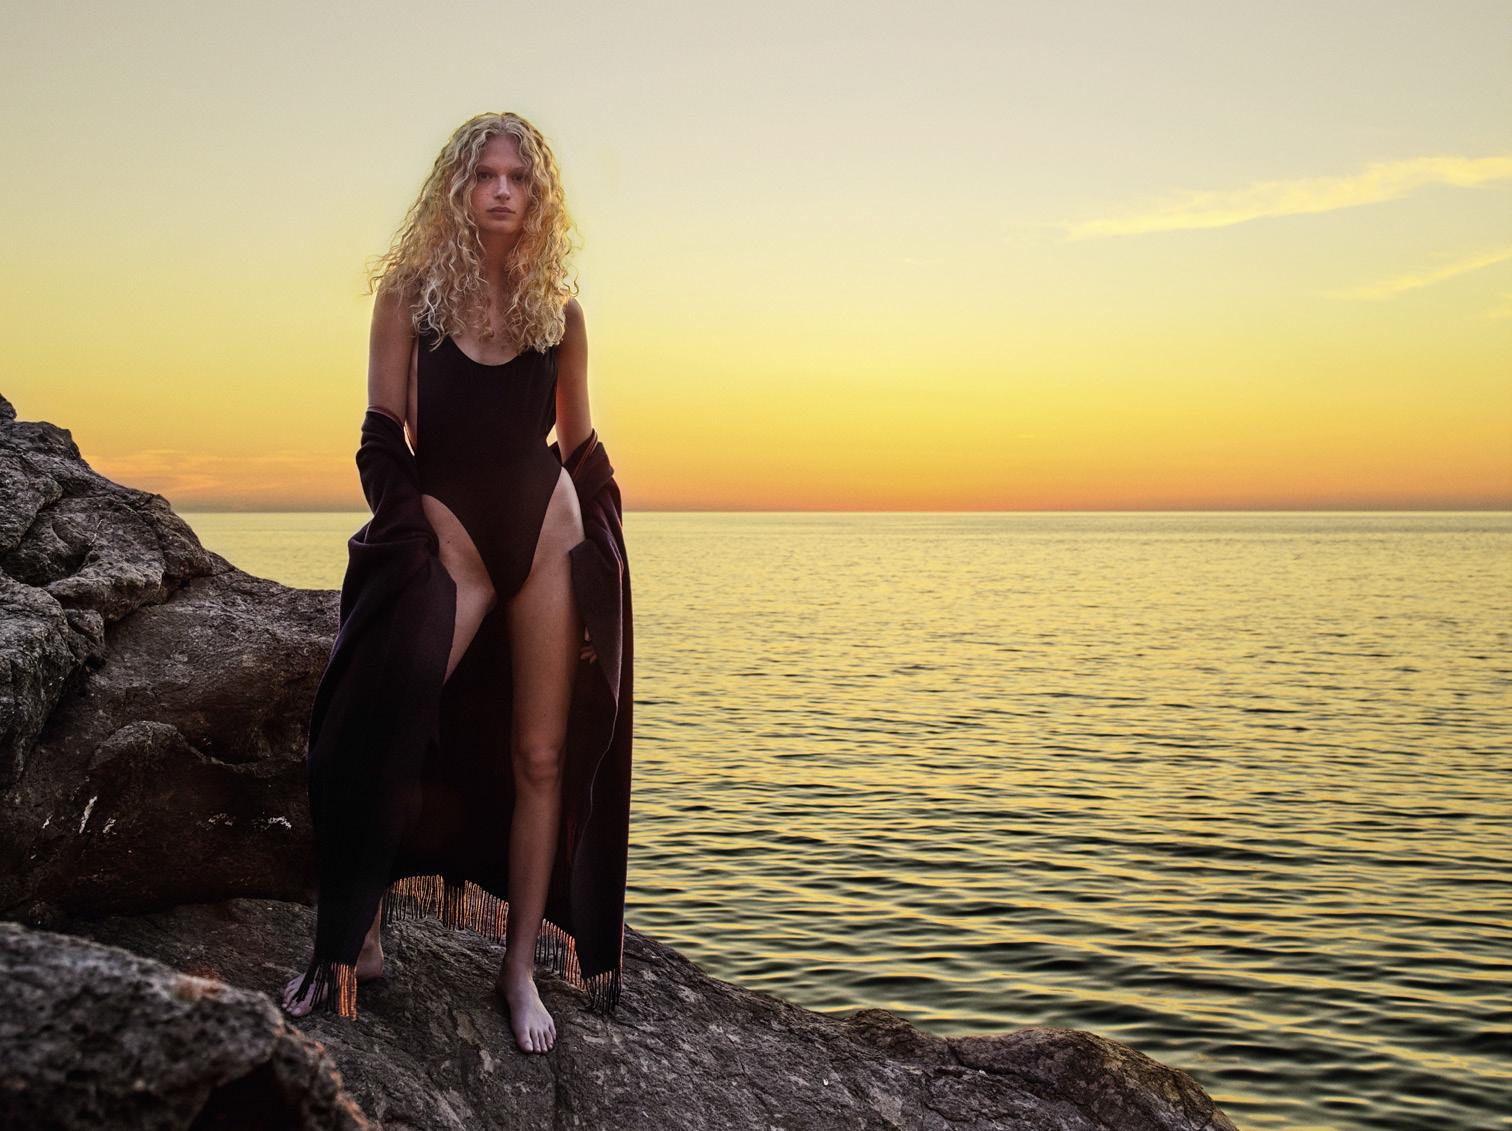 Celebrity Frederikke Sofie Falbe-Hansen nudes (12 photos), Sexy, Leaked, Twitter, butt 2018